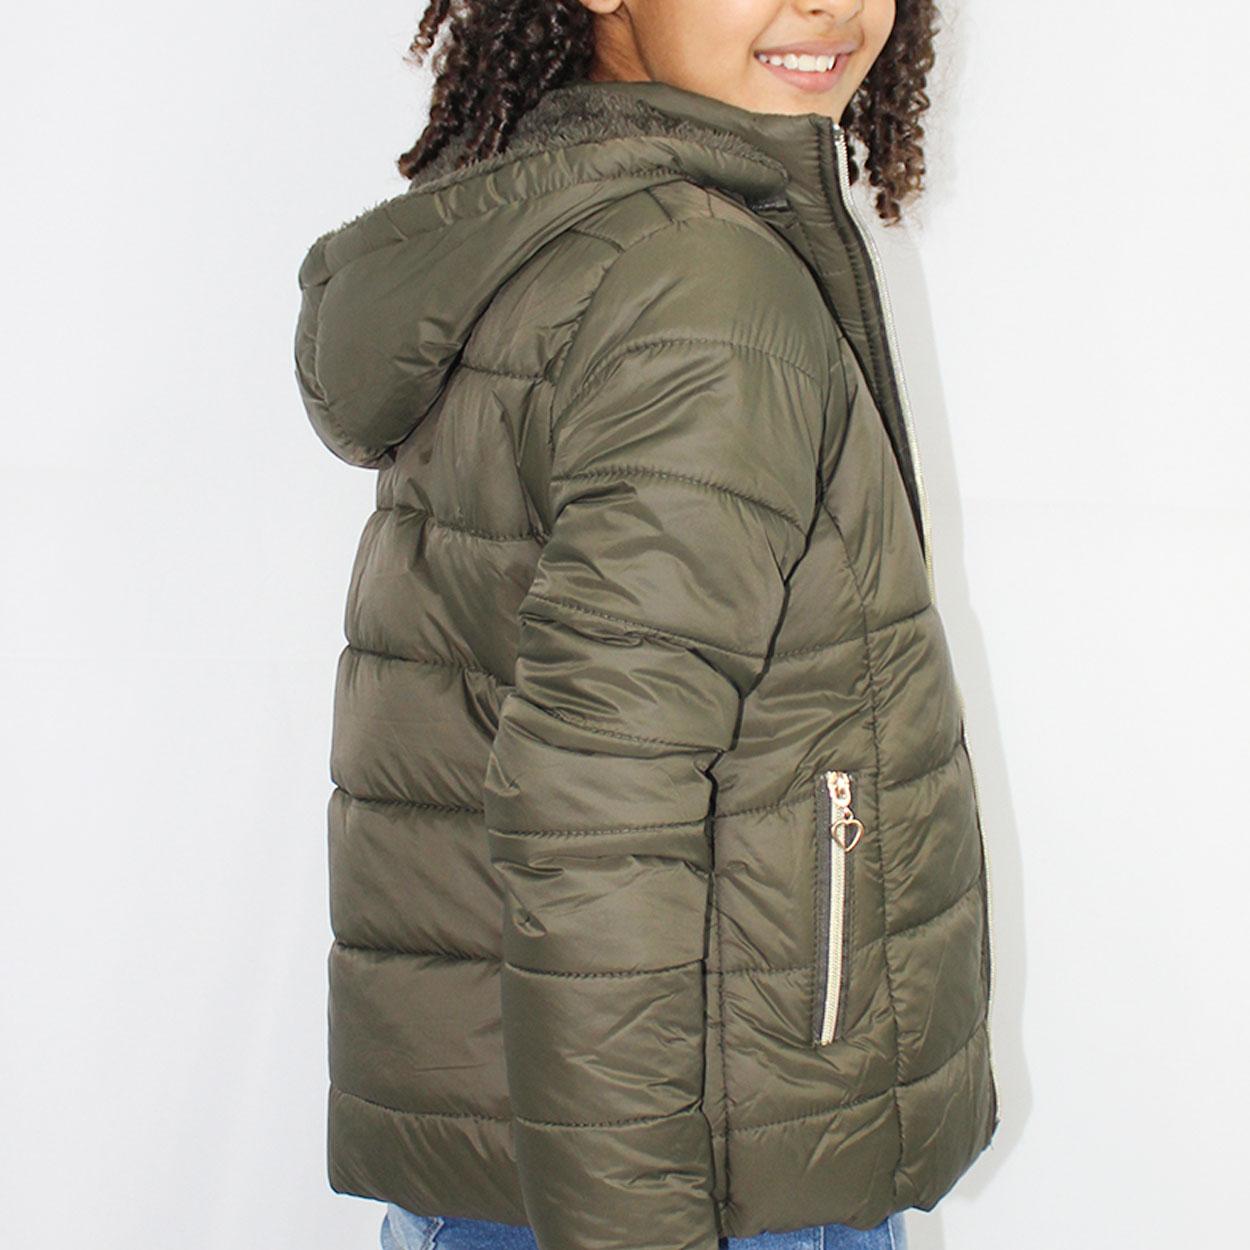 Jaqueta Feminina Infantil em Nylon